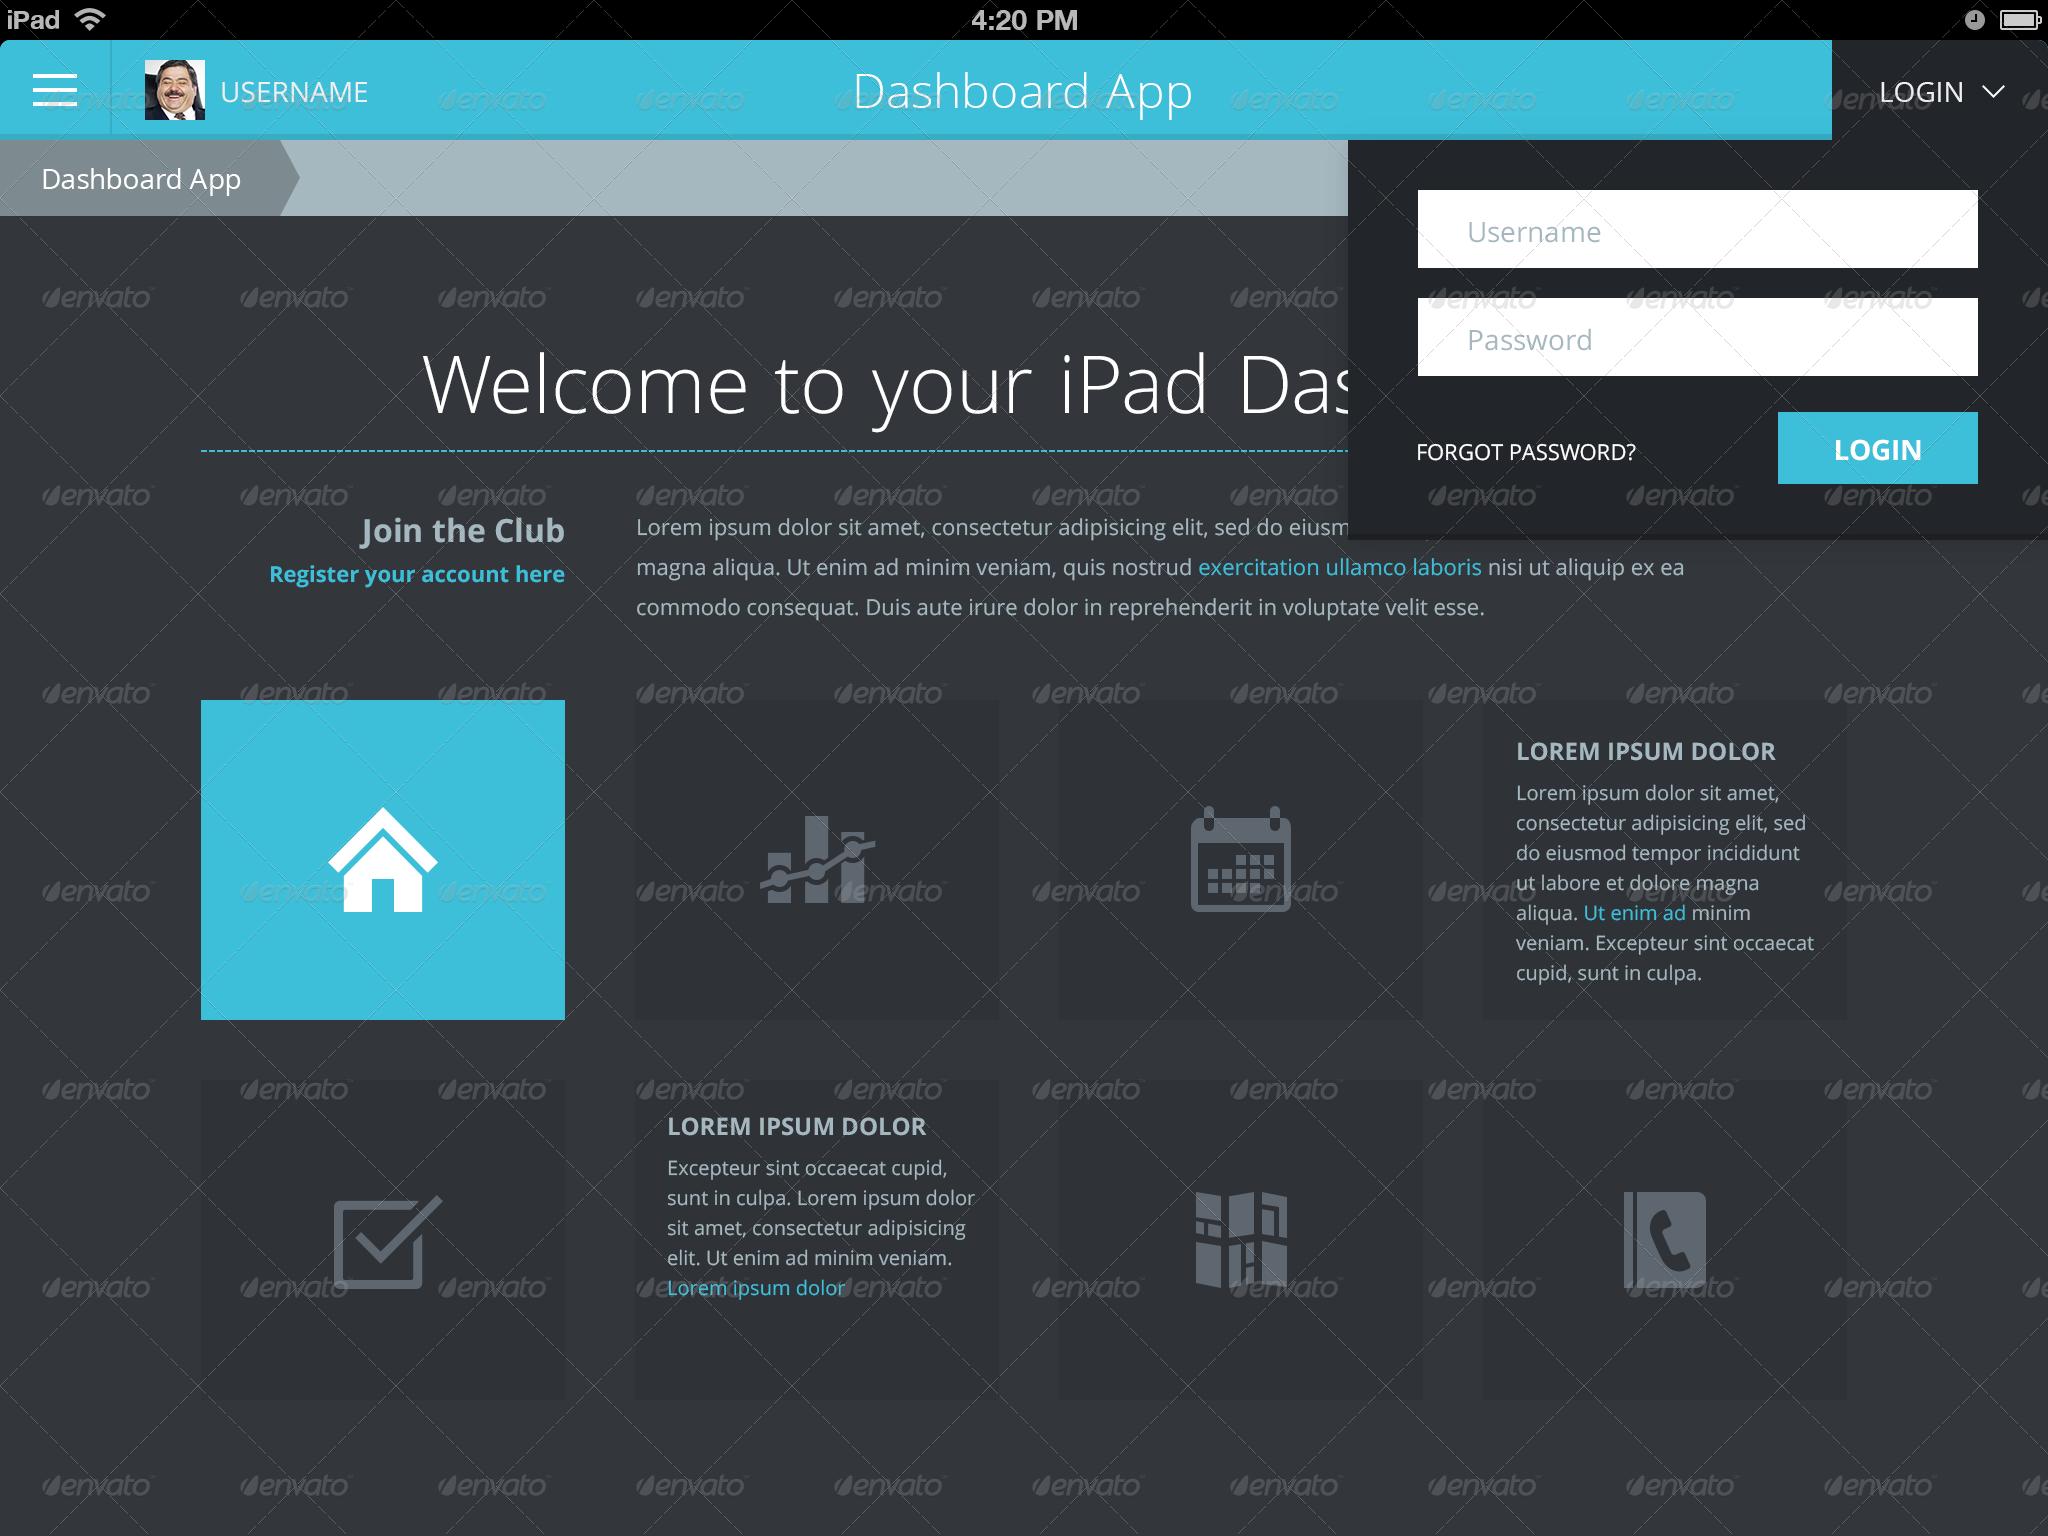 Flat Ipad Ios Tablet App Amp Dashboard By Joelferrell